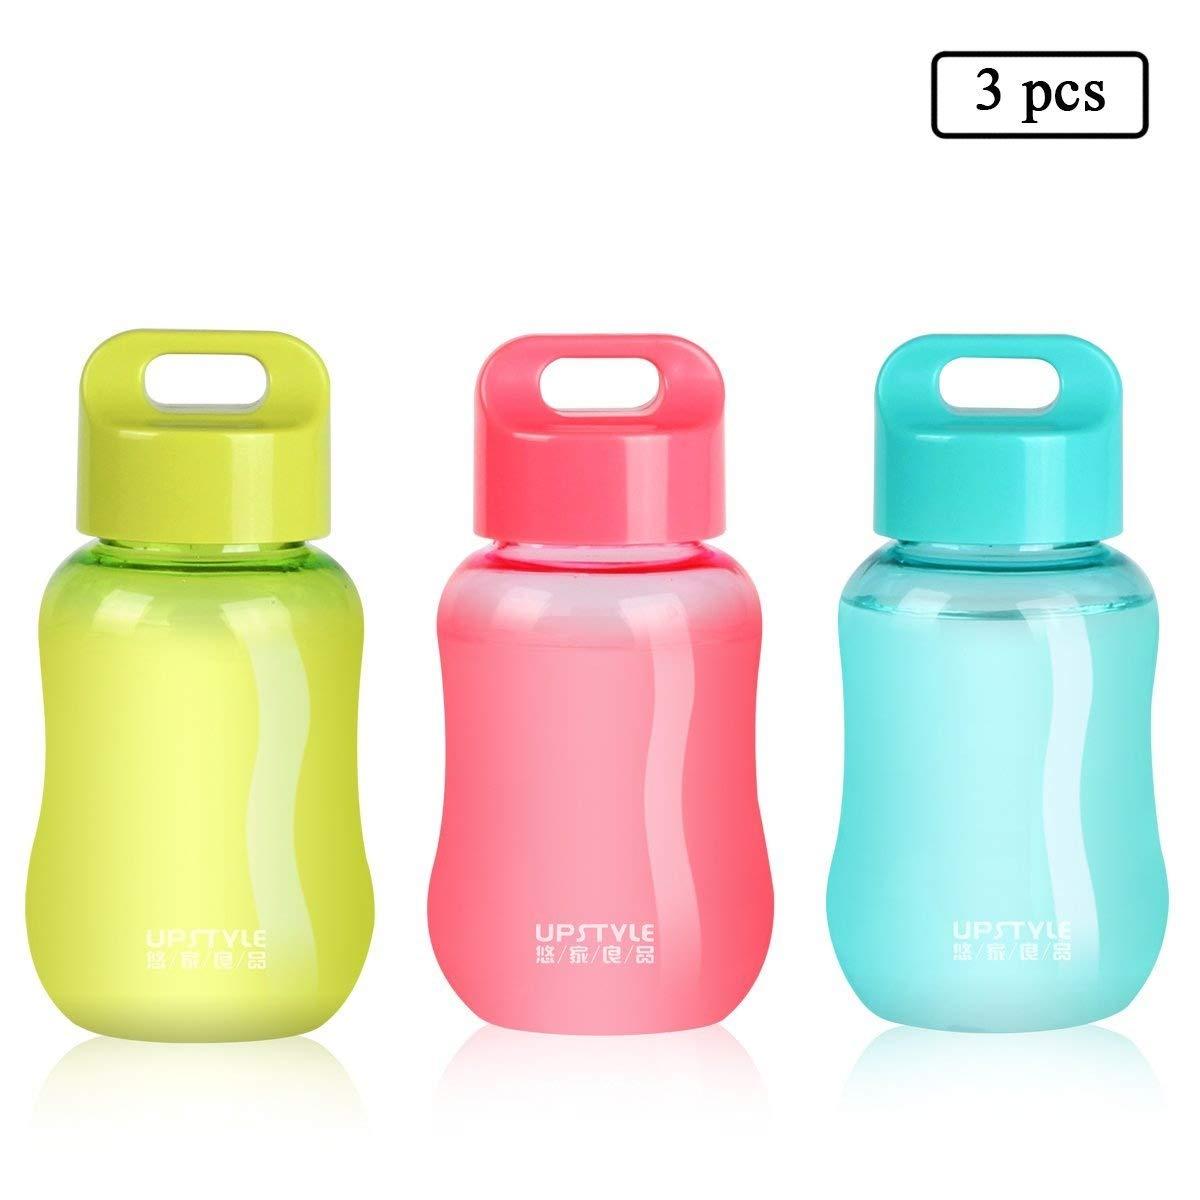 UPSTYLE - Minibotellas de viaje de plástico para viaje, para café, agua, deportes, leche, café, té, zumo, tamaño 180 ml, plástico, Pack of 3, ...